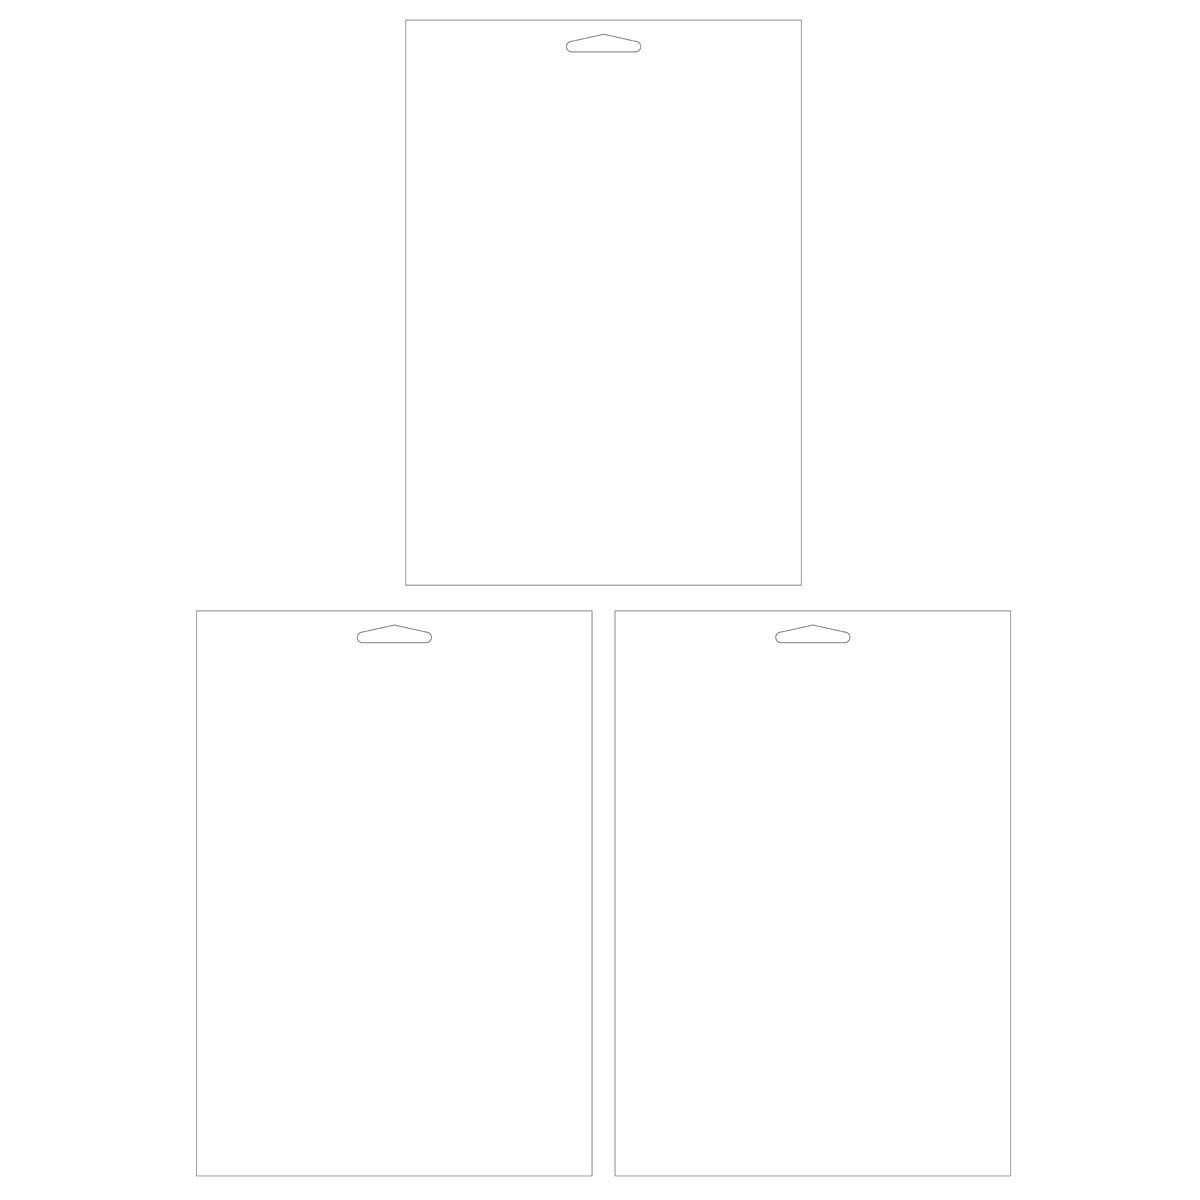 Plaid ® Craft Stencils - Value Packs - Blanks - 30502